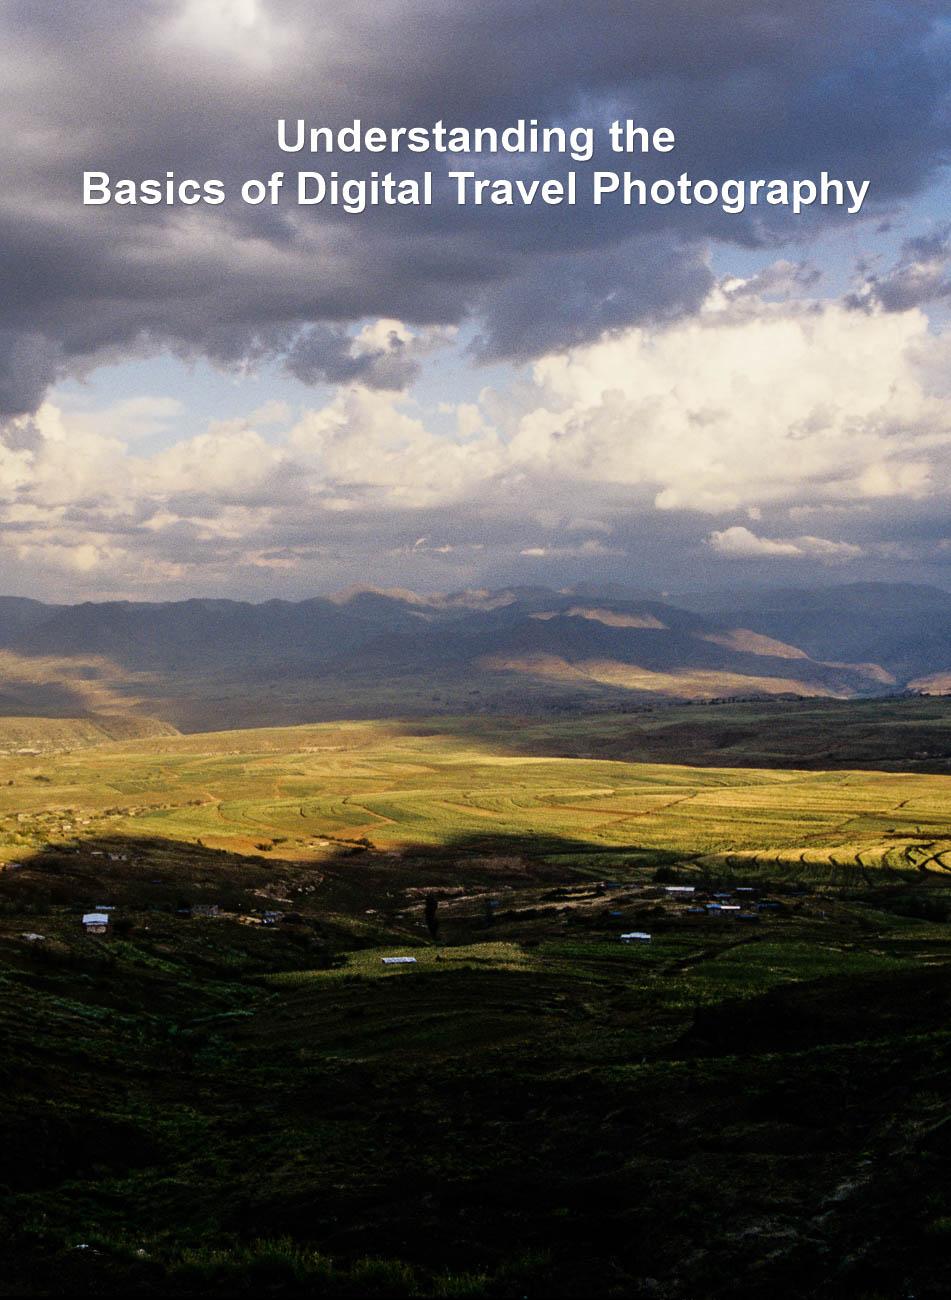 Understanding the Basics of Digital Travel Photography